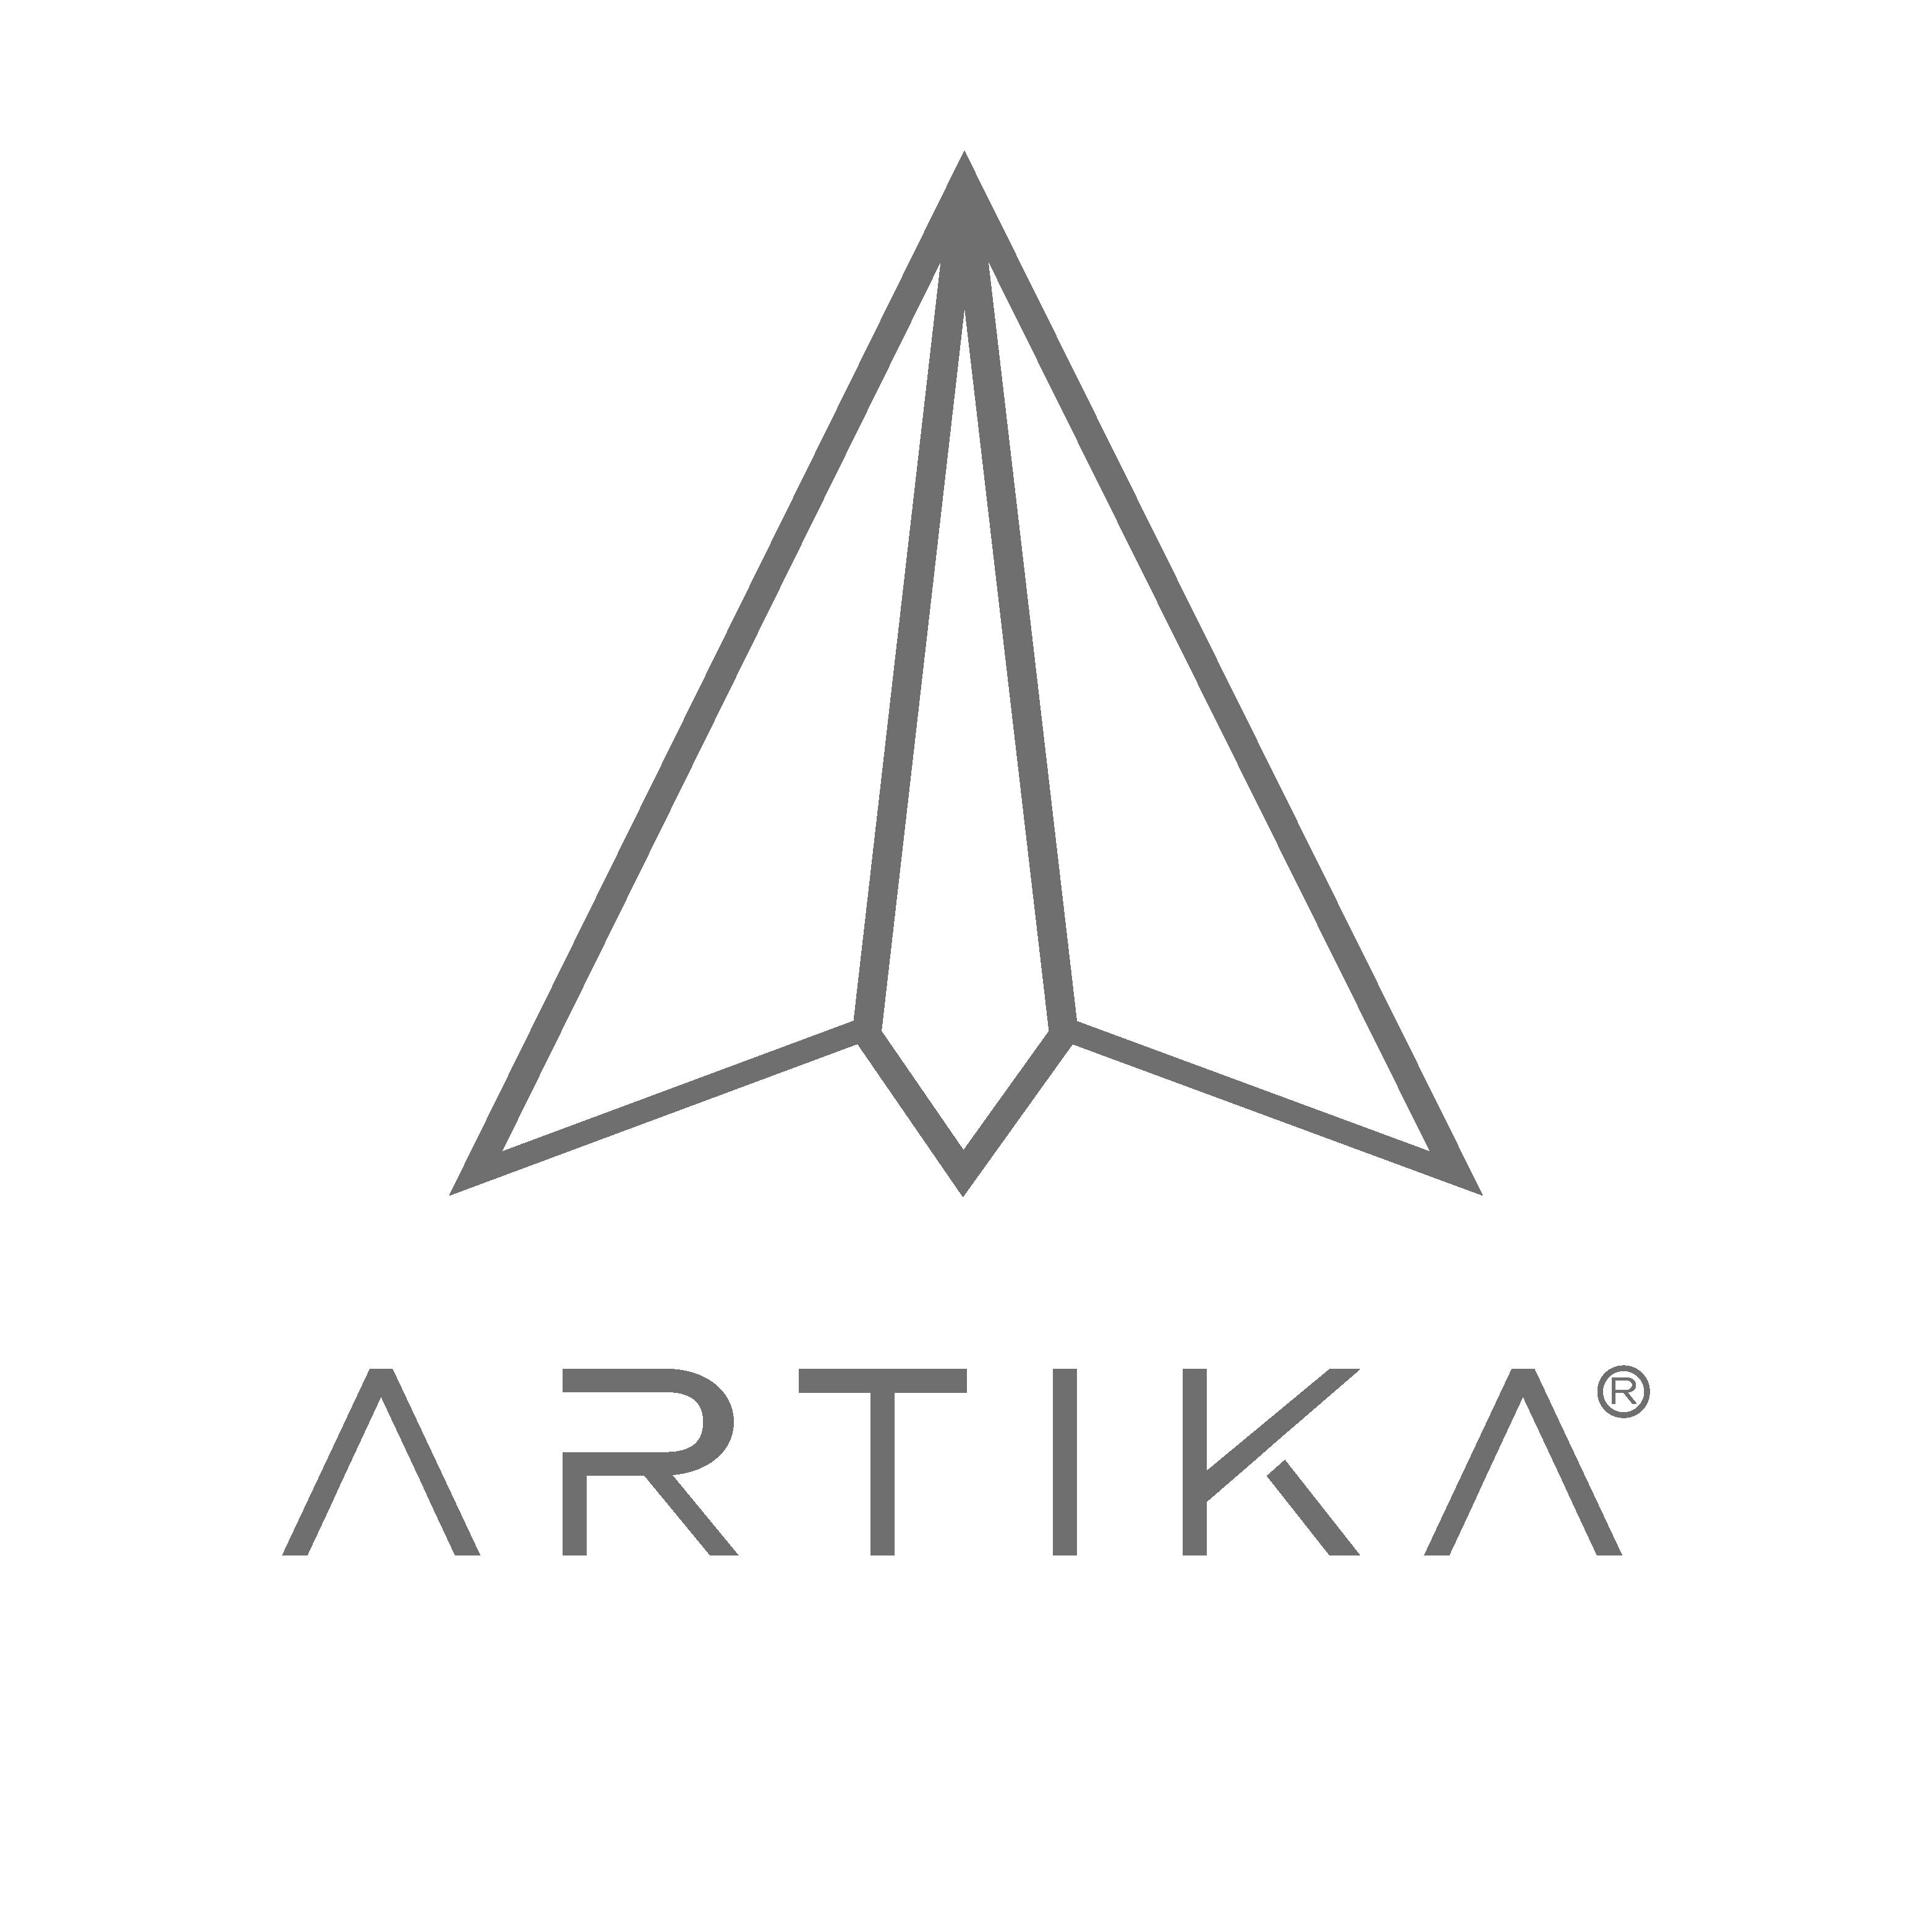 Artika Design